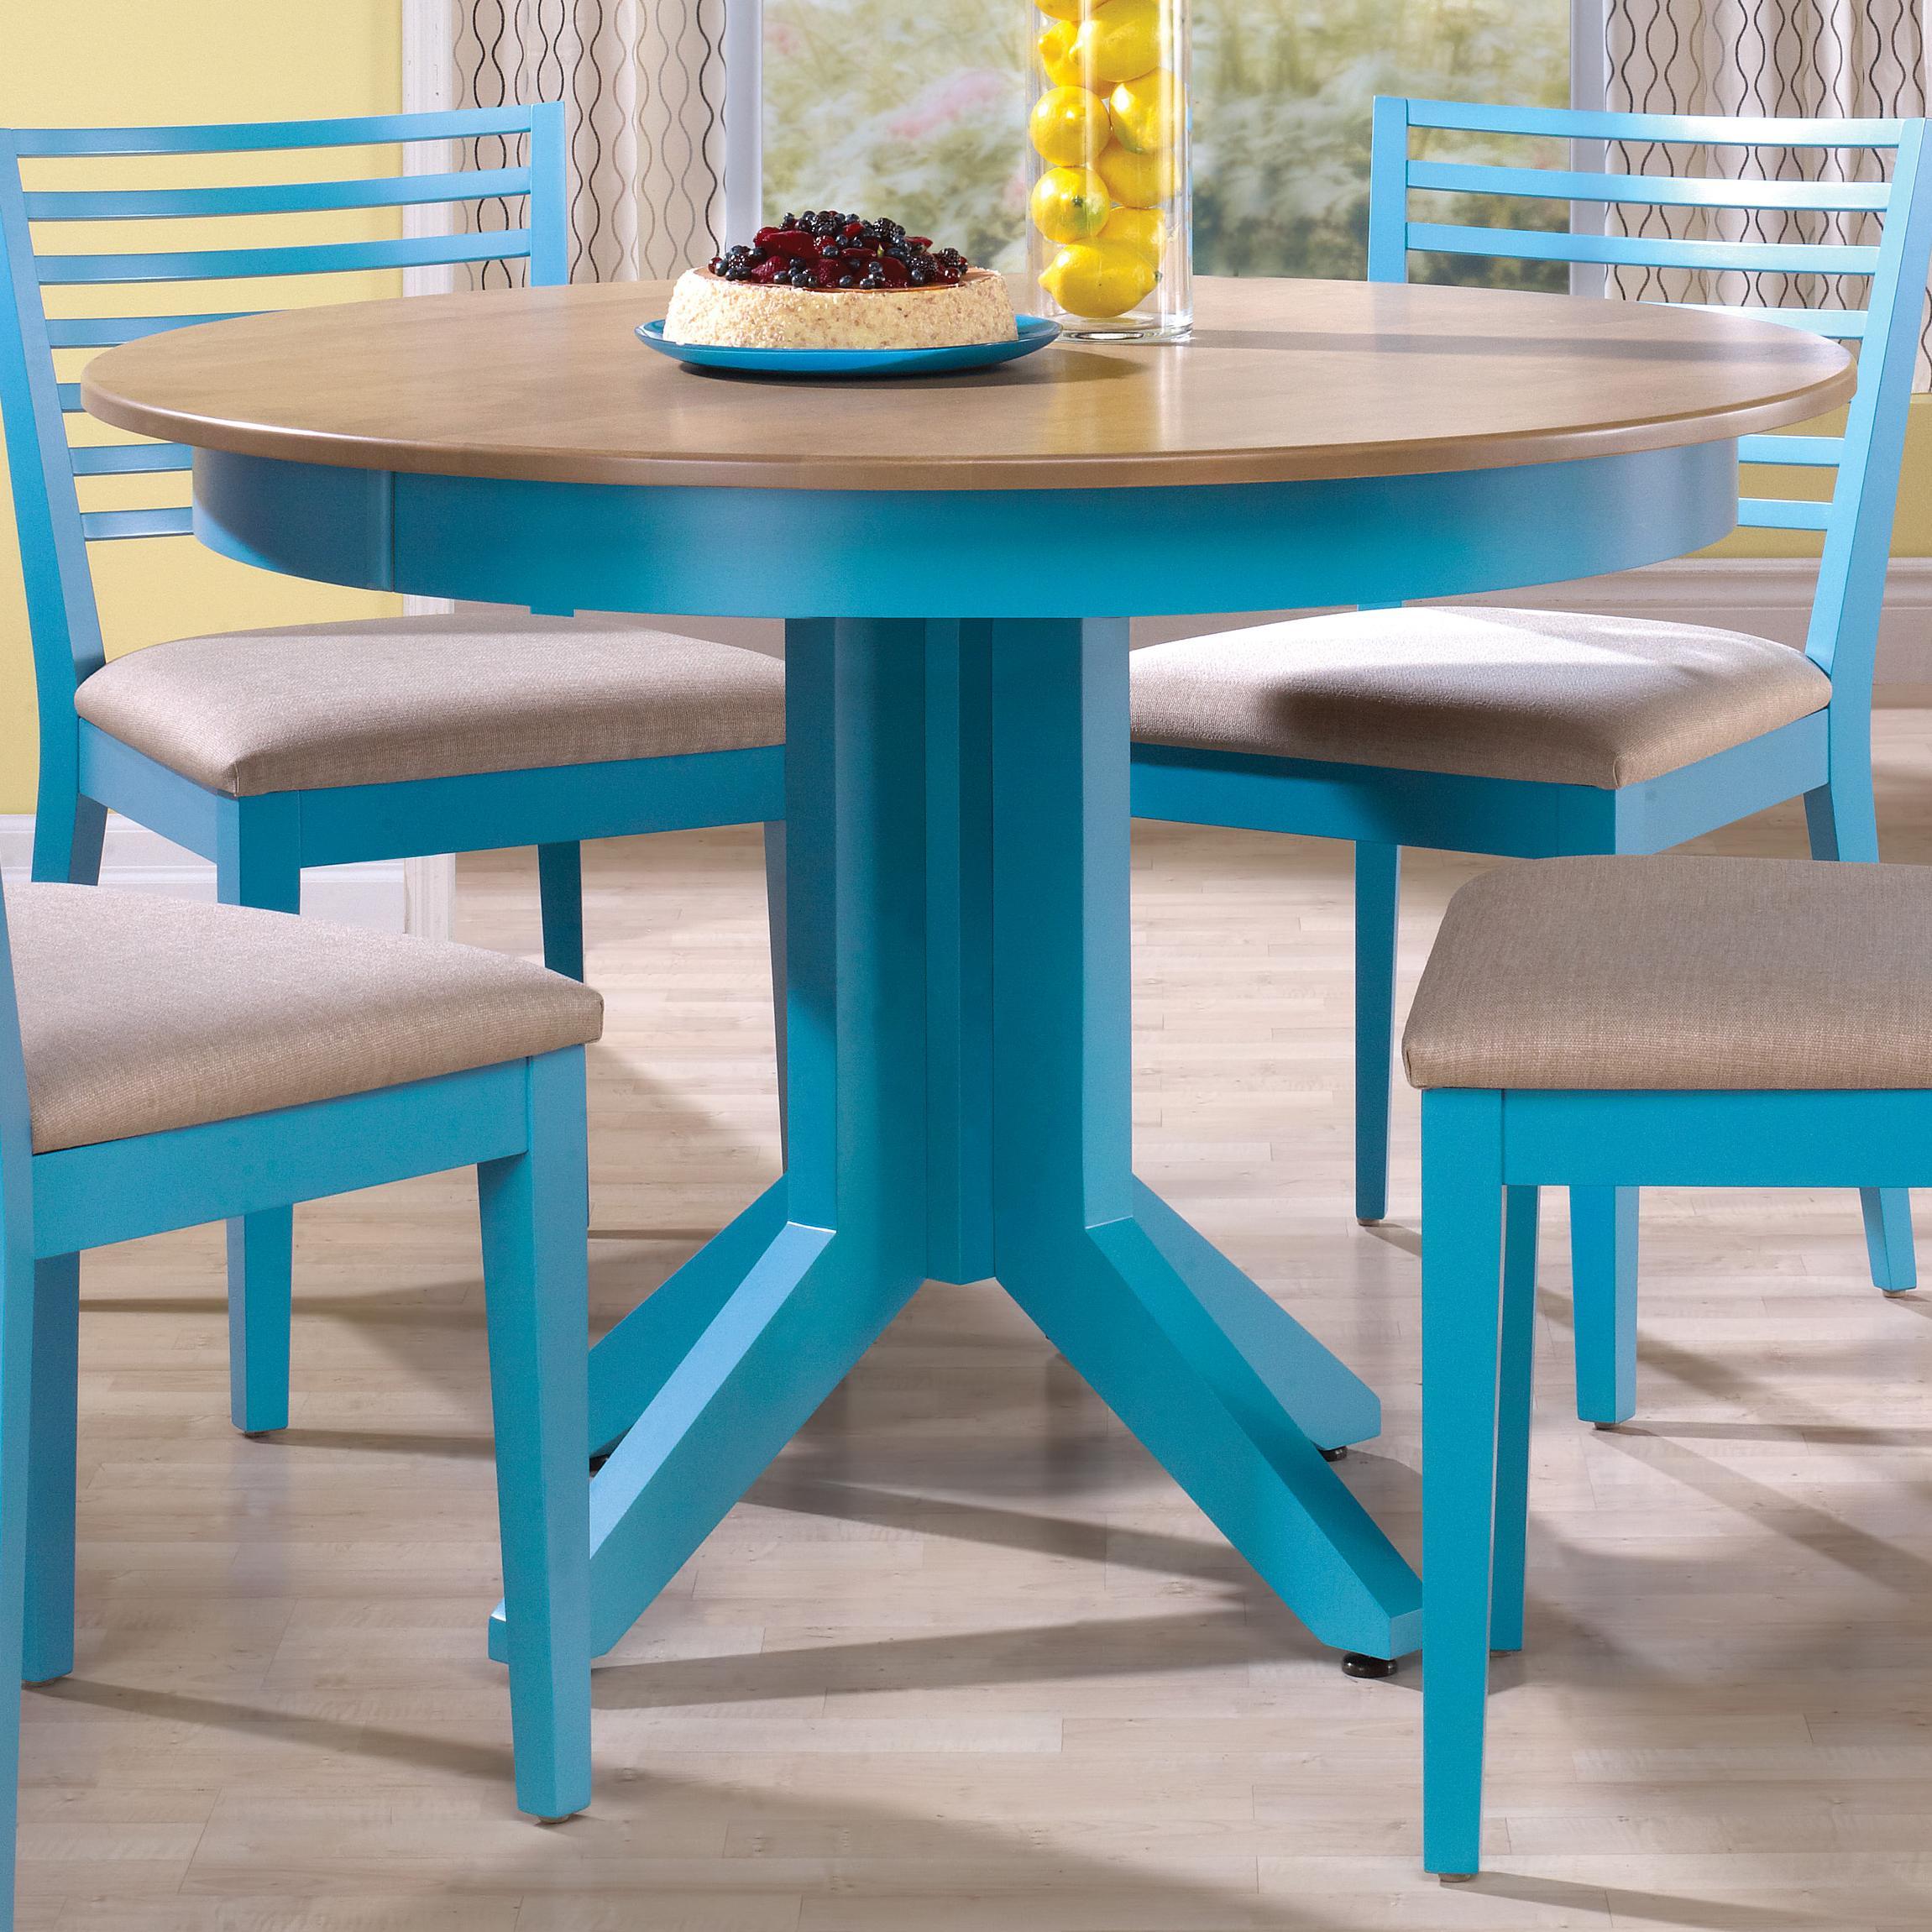 Canadel Custom Diningu003cbu003eCustomizableu003c/bu003e Round Table W/ Pedestal ...